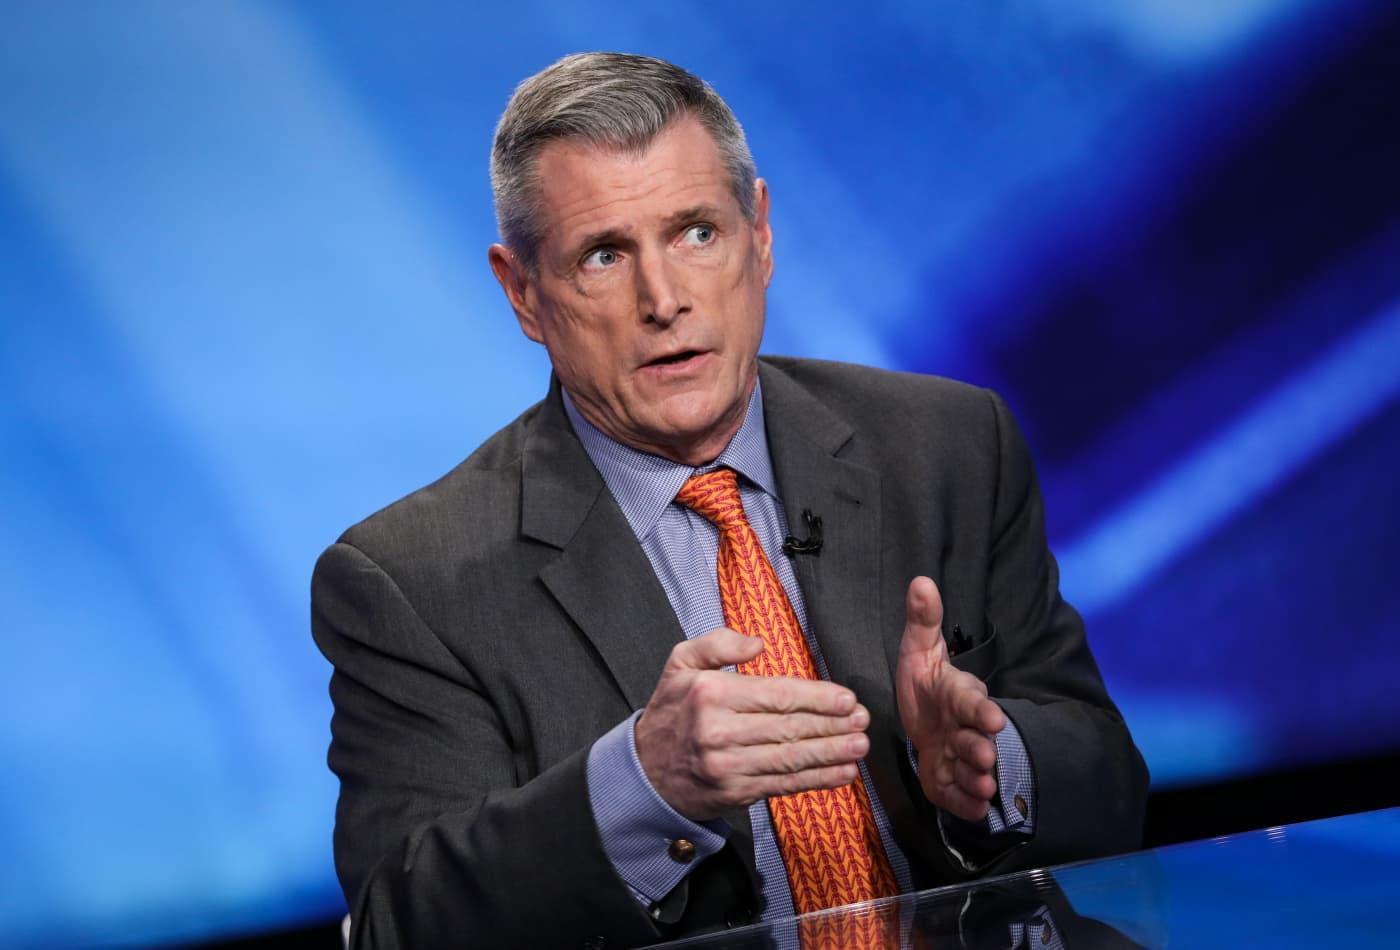 Stocks will bottom before US coronavirus cases peak, top strategist Art Hogan predicts